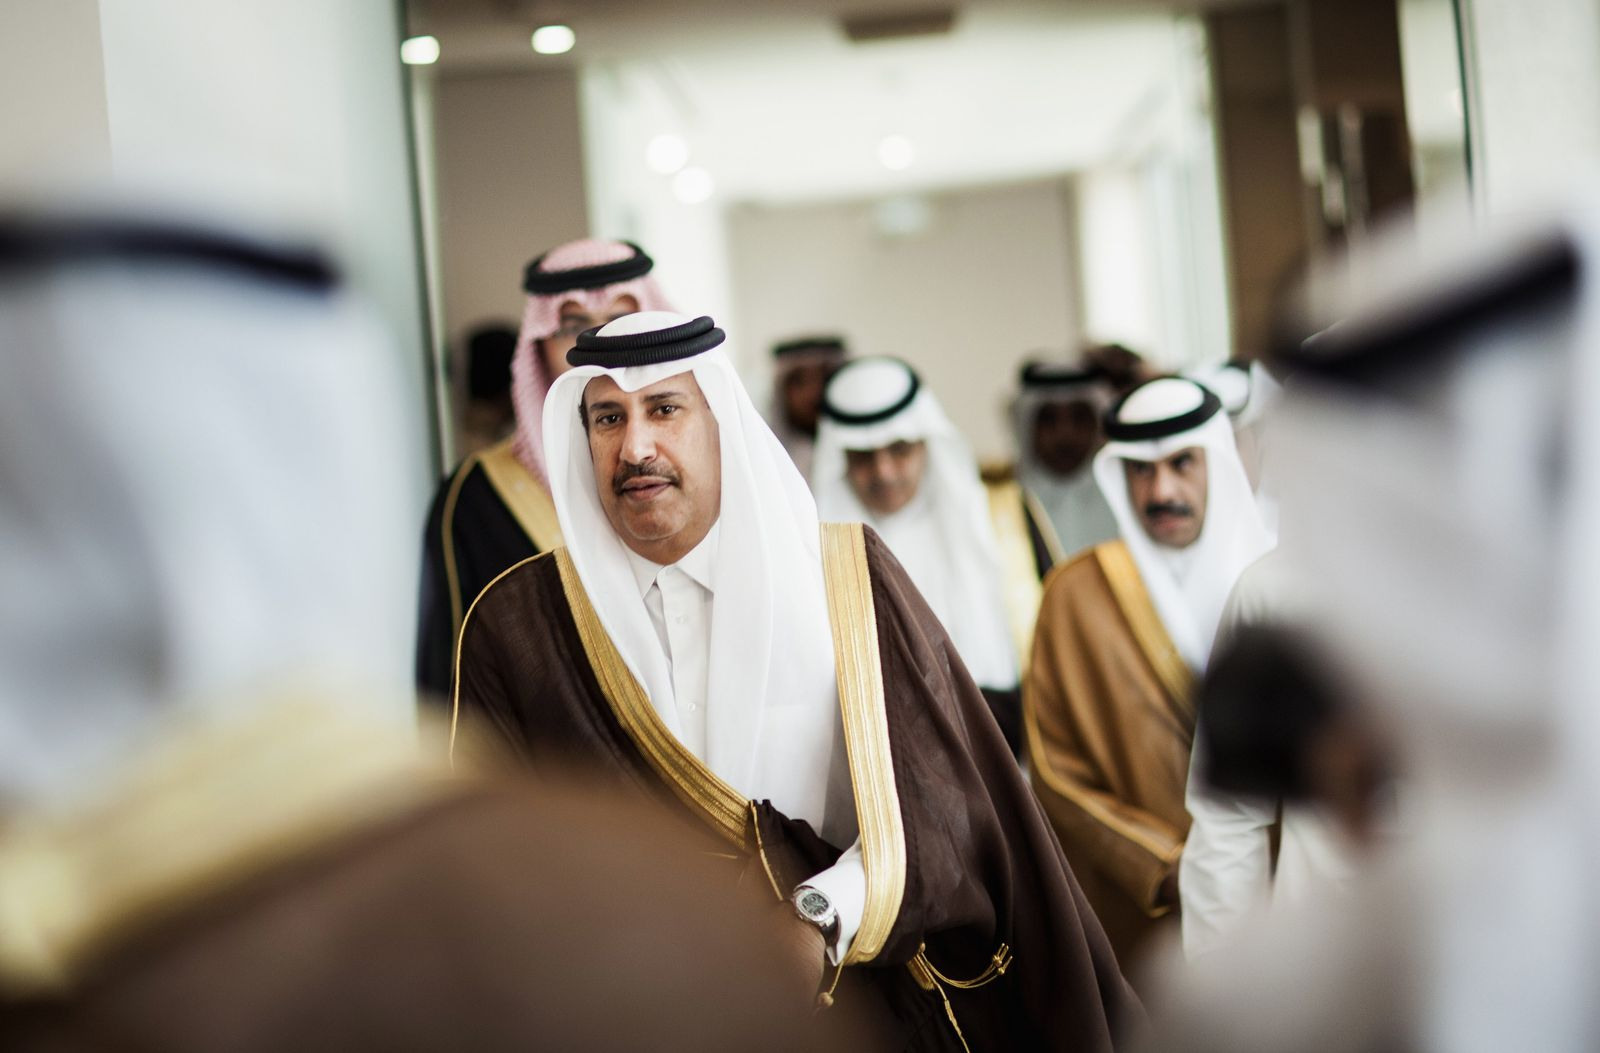 Sheikh Hamad bin Jassim bin Jabor Al Thani